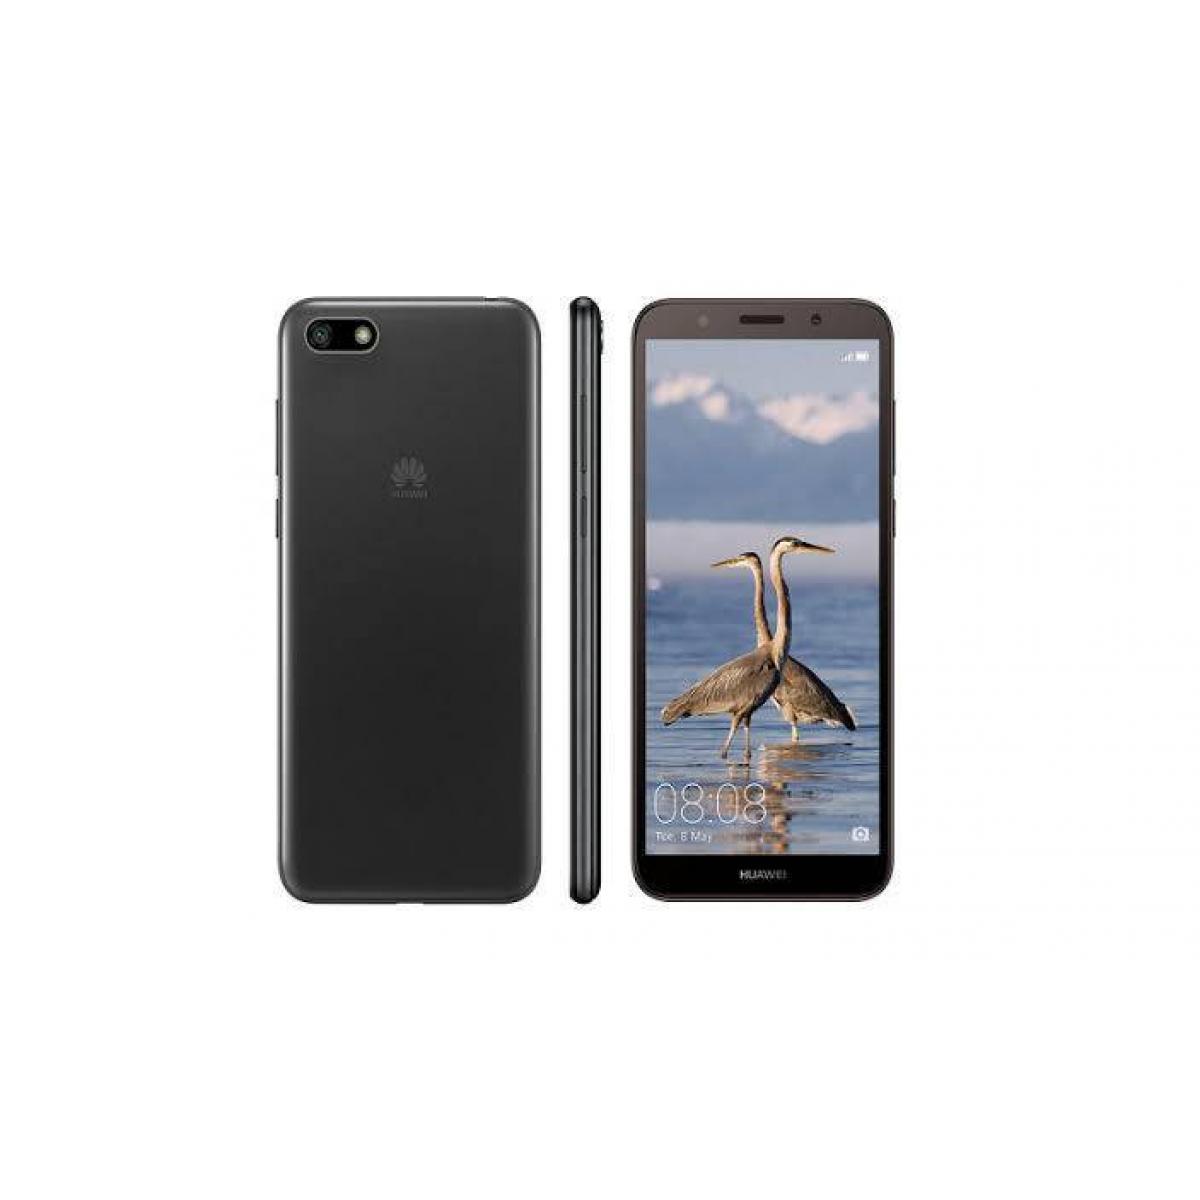 Mobile Phone Huawei Y5 Prime 2018 | GTS - Amman Jordan | GTS